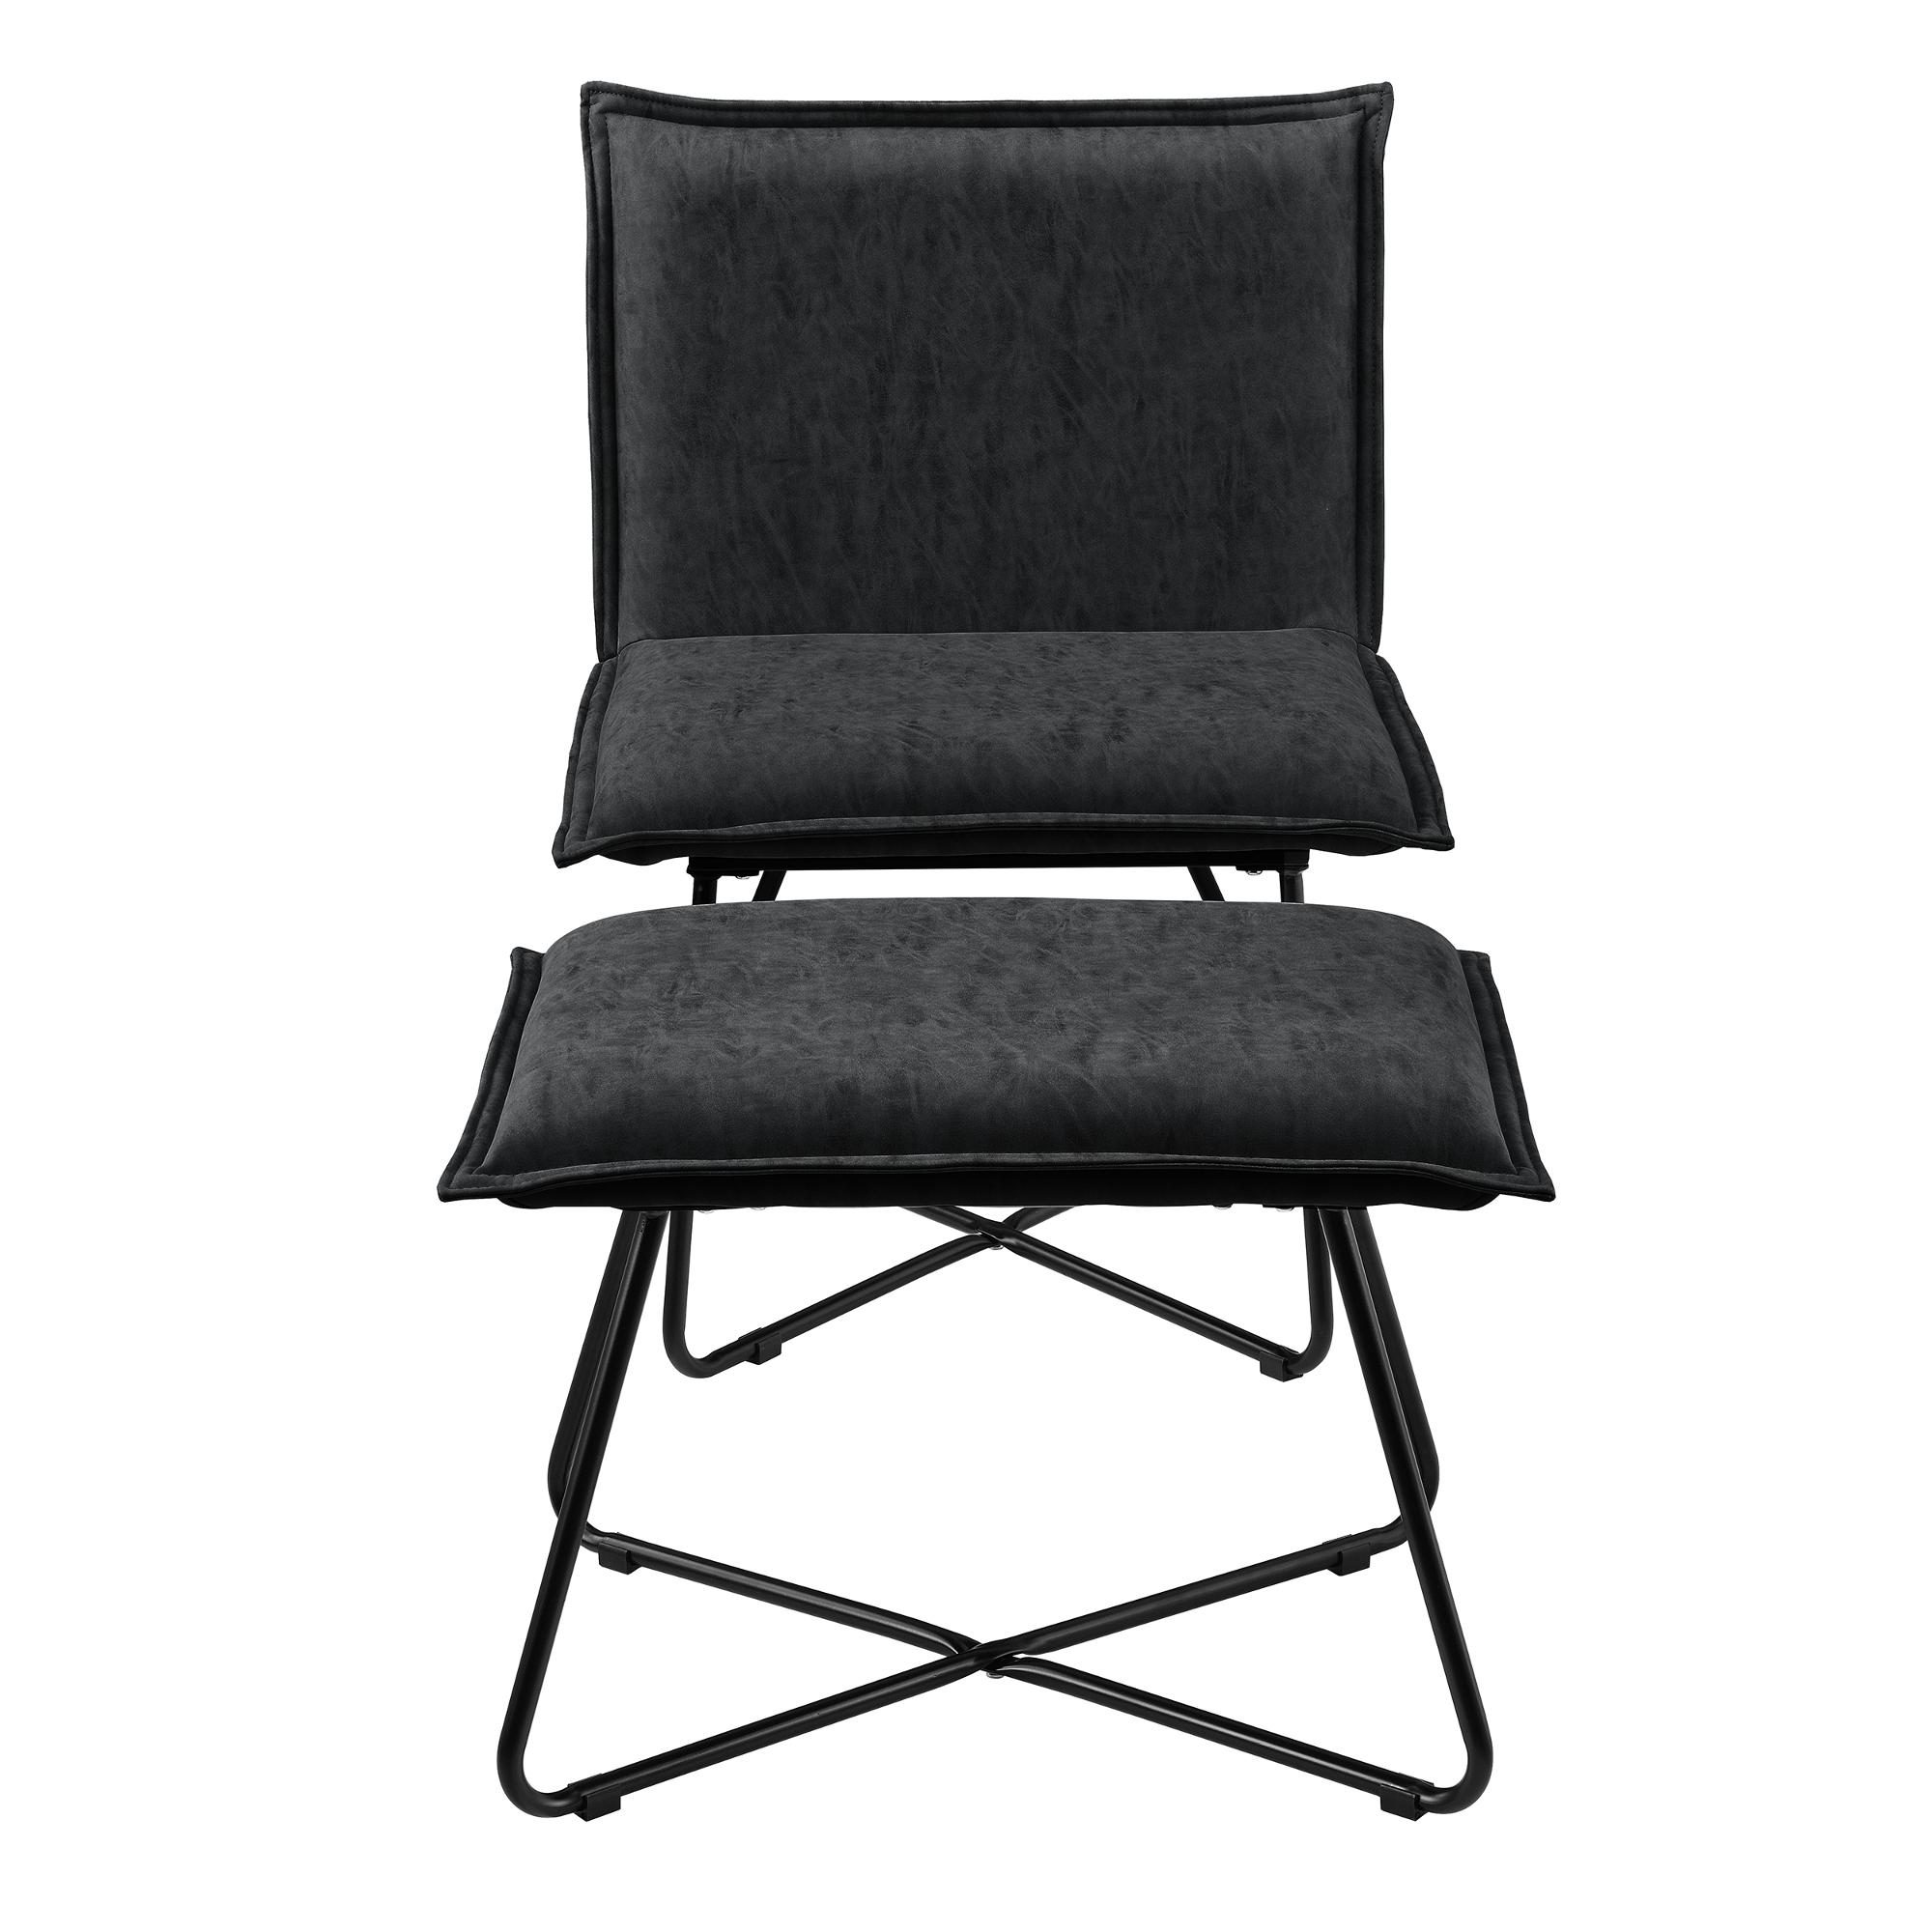 Sessel mit fu hocker schwarz wildlederimitat for Stuhl hocker